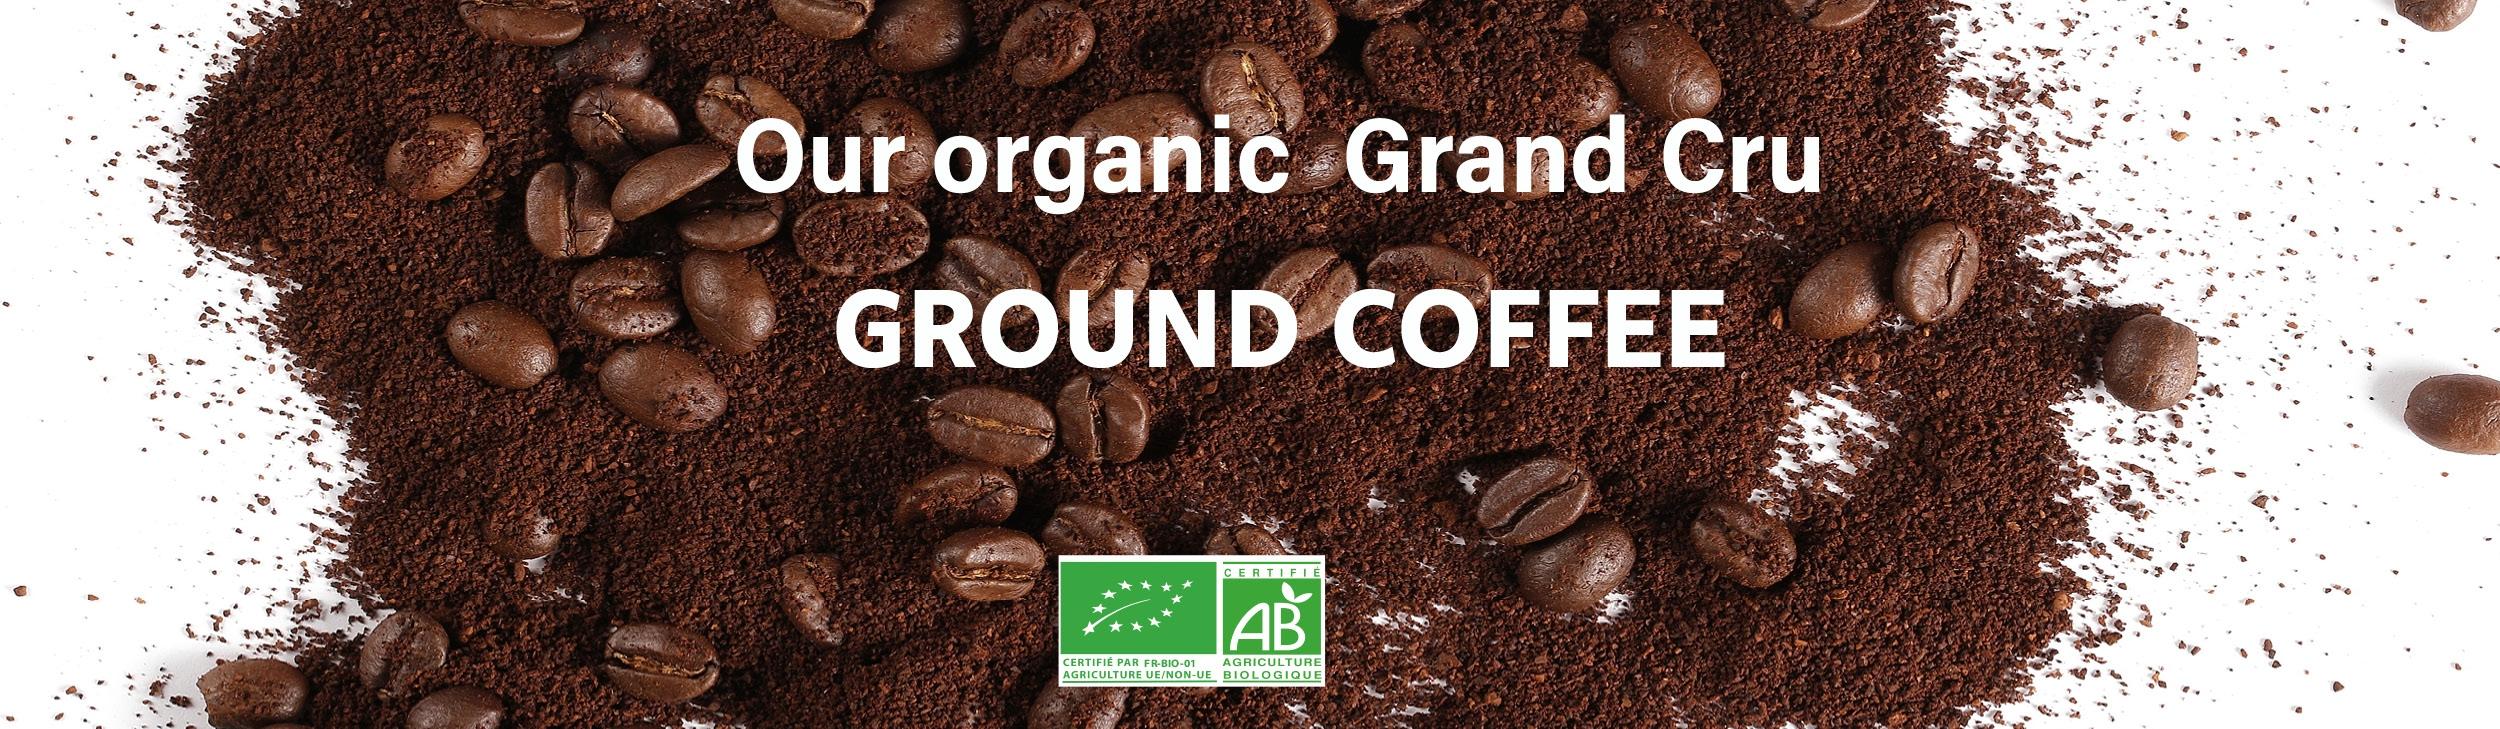 Ground organic coffee